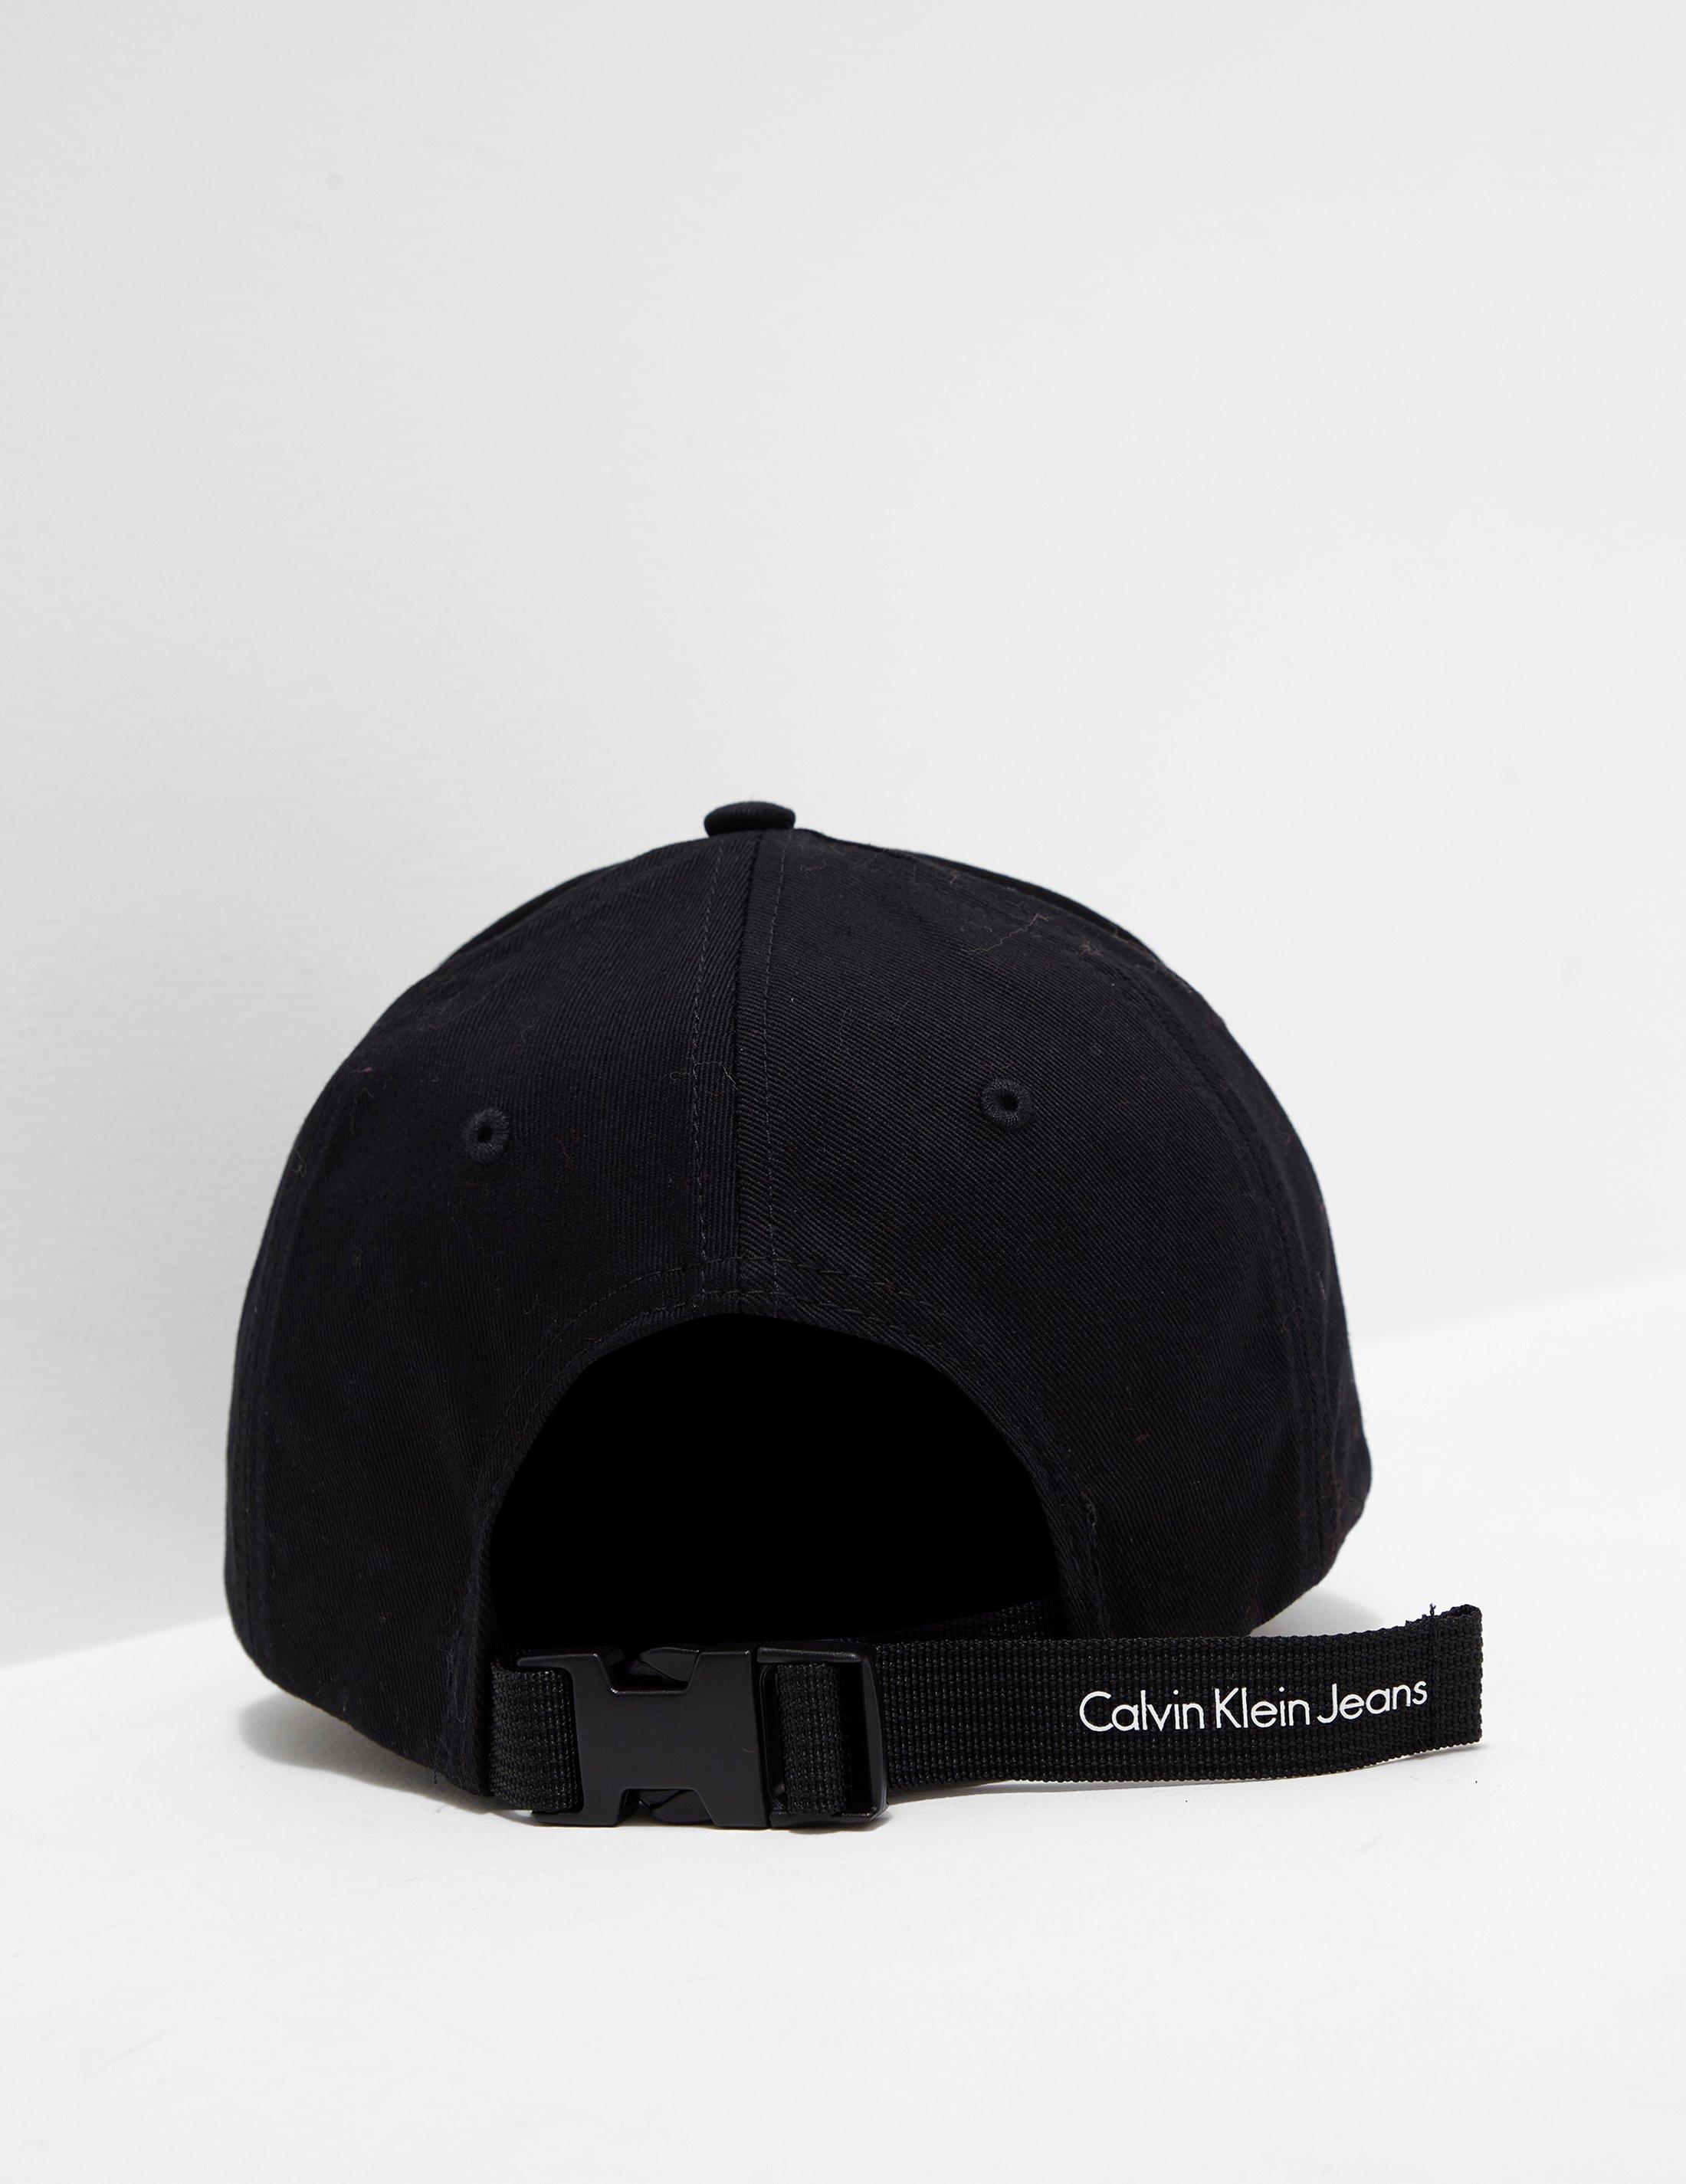 b9ecd591b10 Calvin Klein 205W39Nyc Mens Reissue Cap Black in Black for Men - Lyst